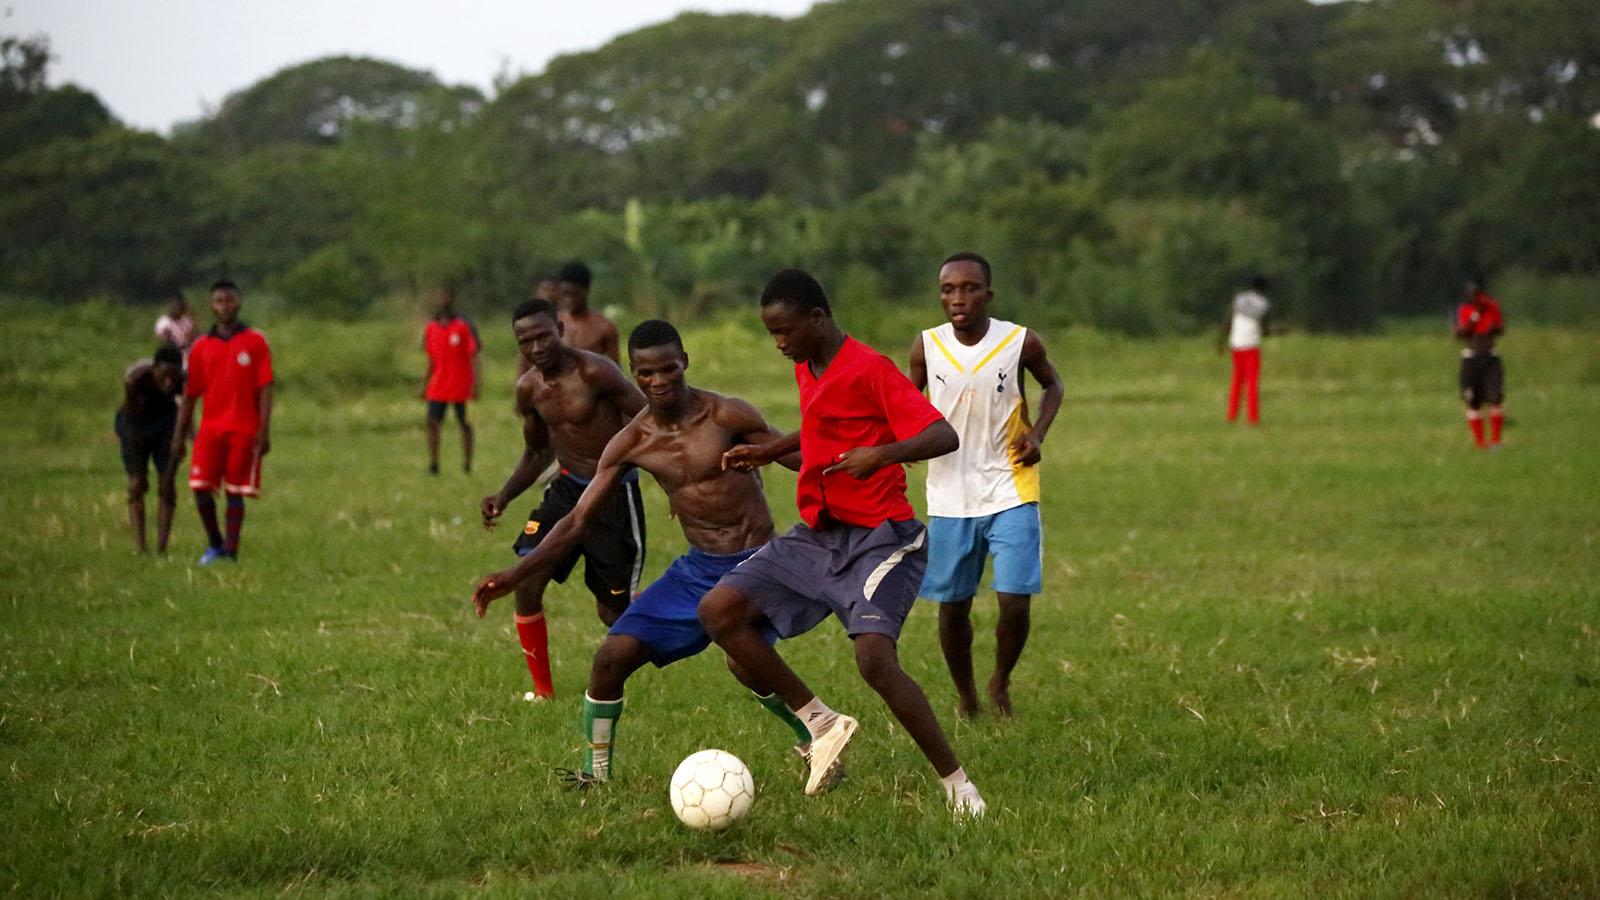 10-step guide to football trafficking - Loughborough News Blog ... 6c2429b98